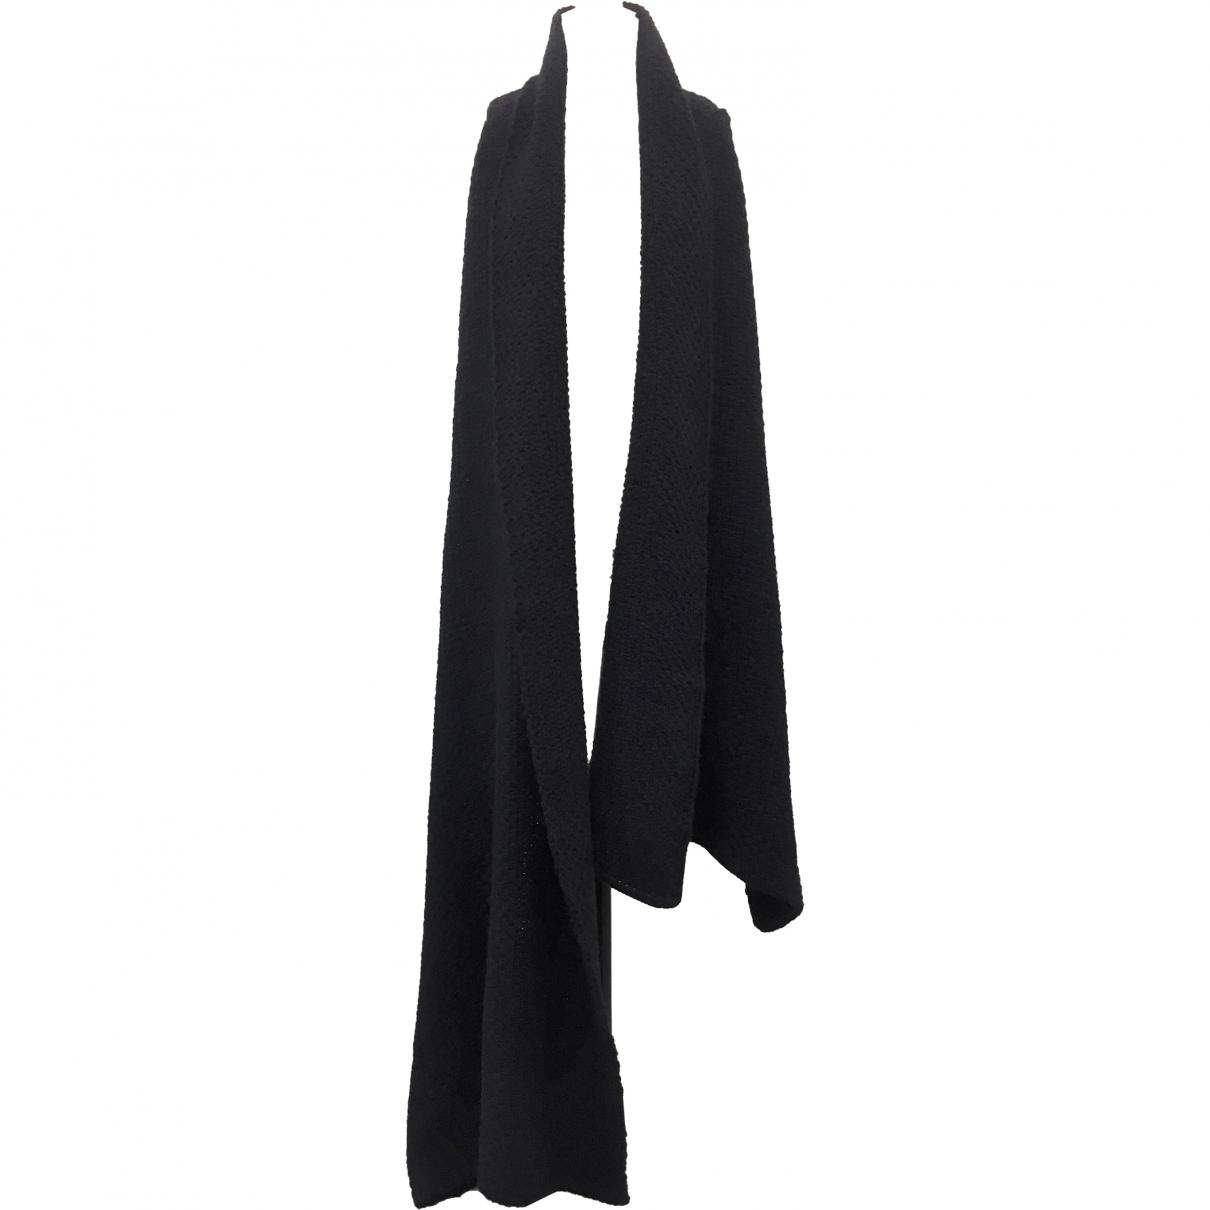 Haider Ackermann \N Black Wool Knitwear for Women S International